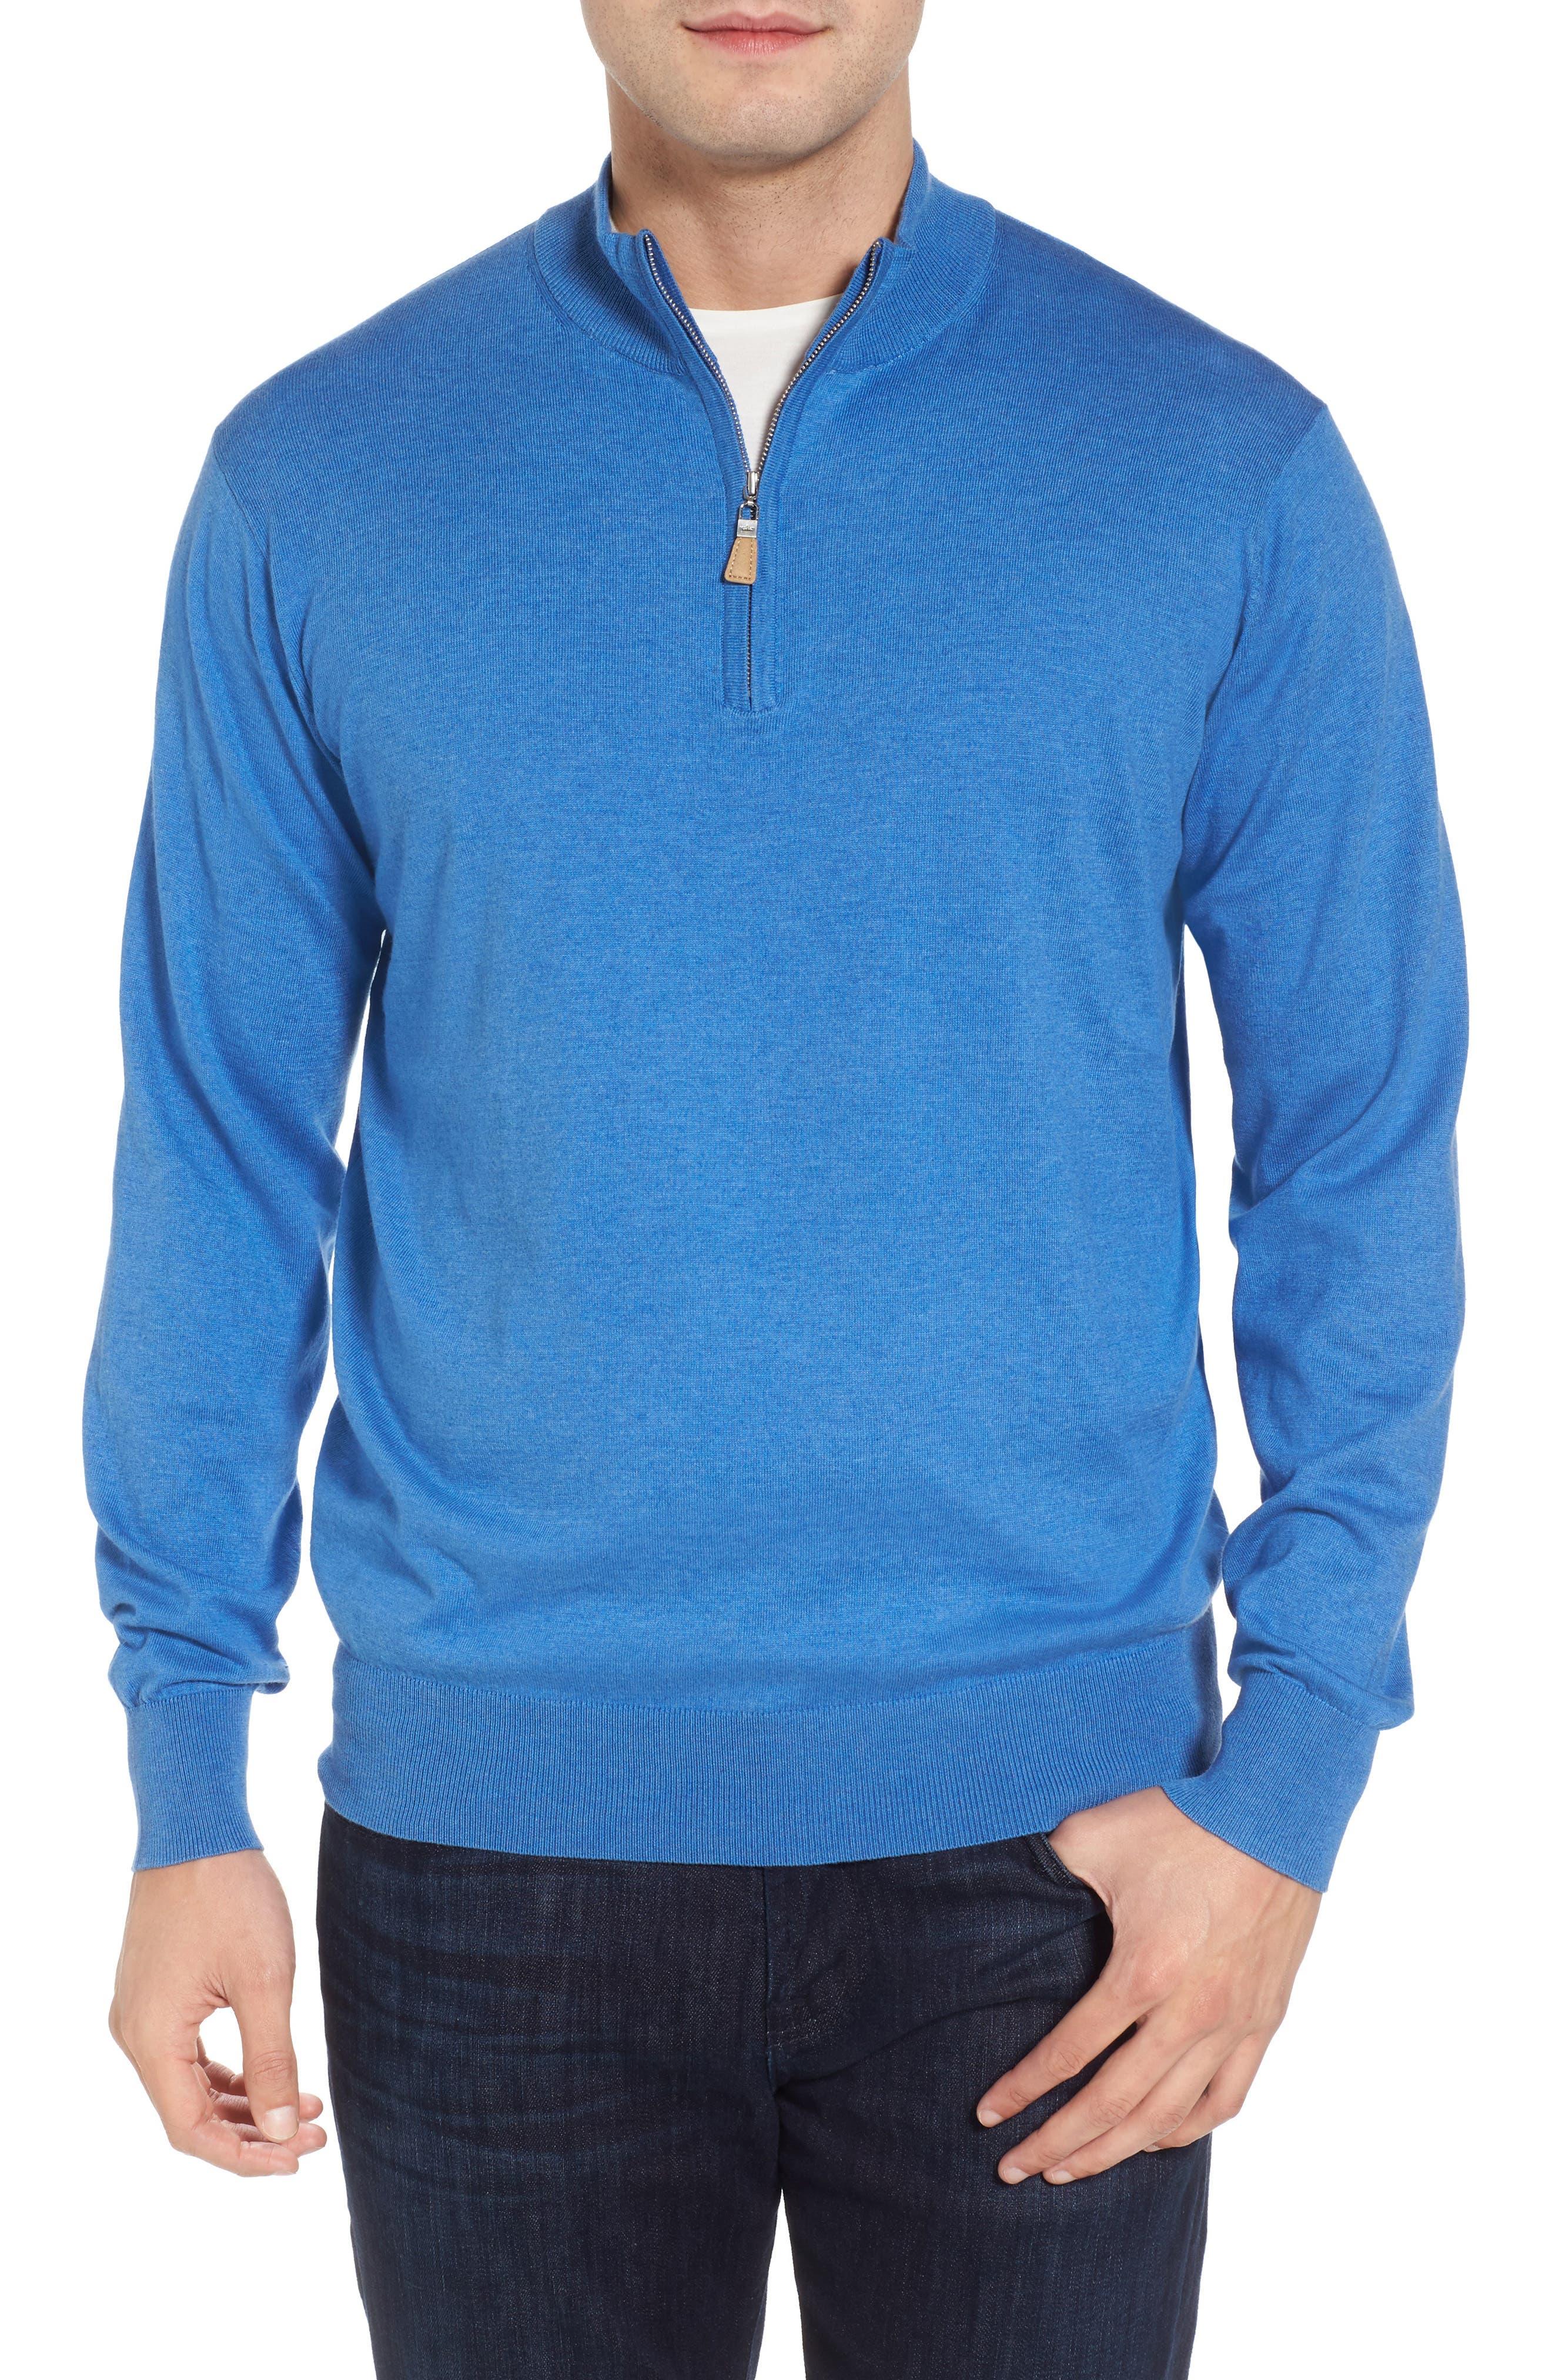 Crown Soft Quarter-Zip Pullover,                             Main thumbnail 1, color,                             Boardwalk Blue